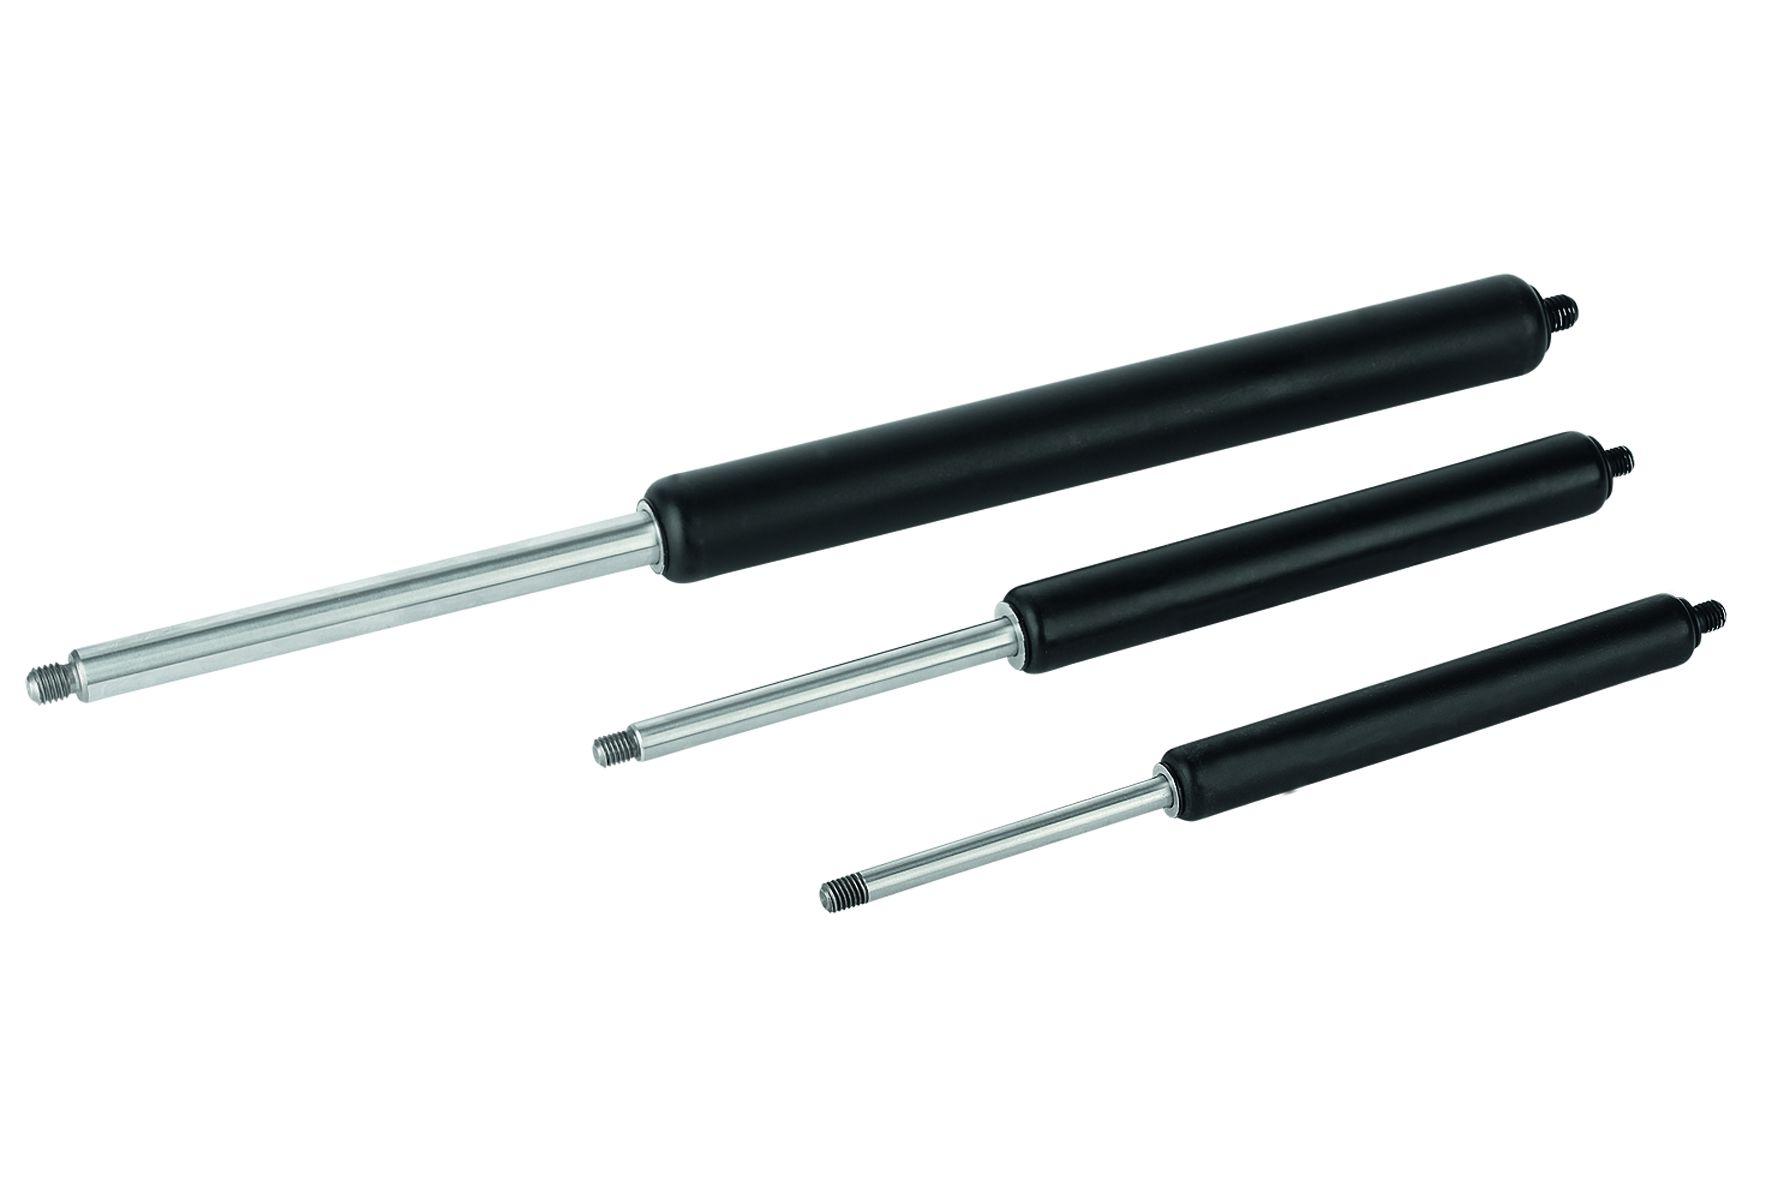 Material: Piston rod and pressure tube steel. Fill medium: oil, nitrogen. Version: Piston rod, hard ...